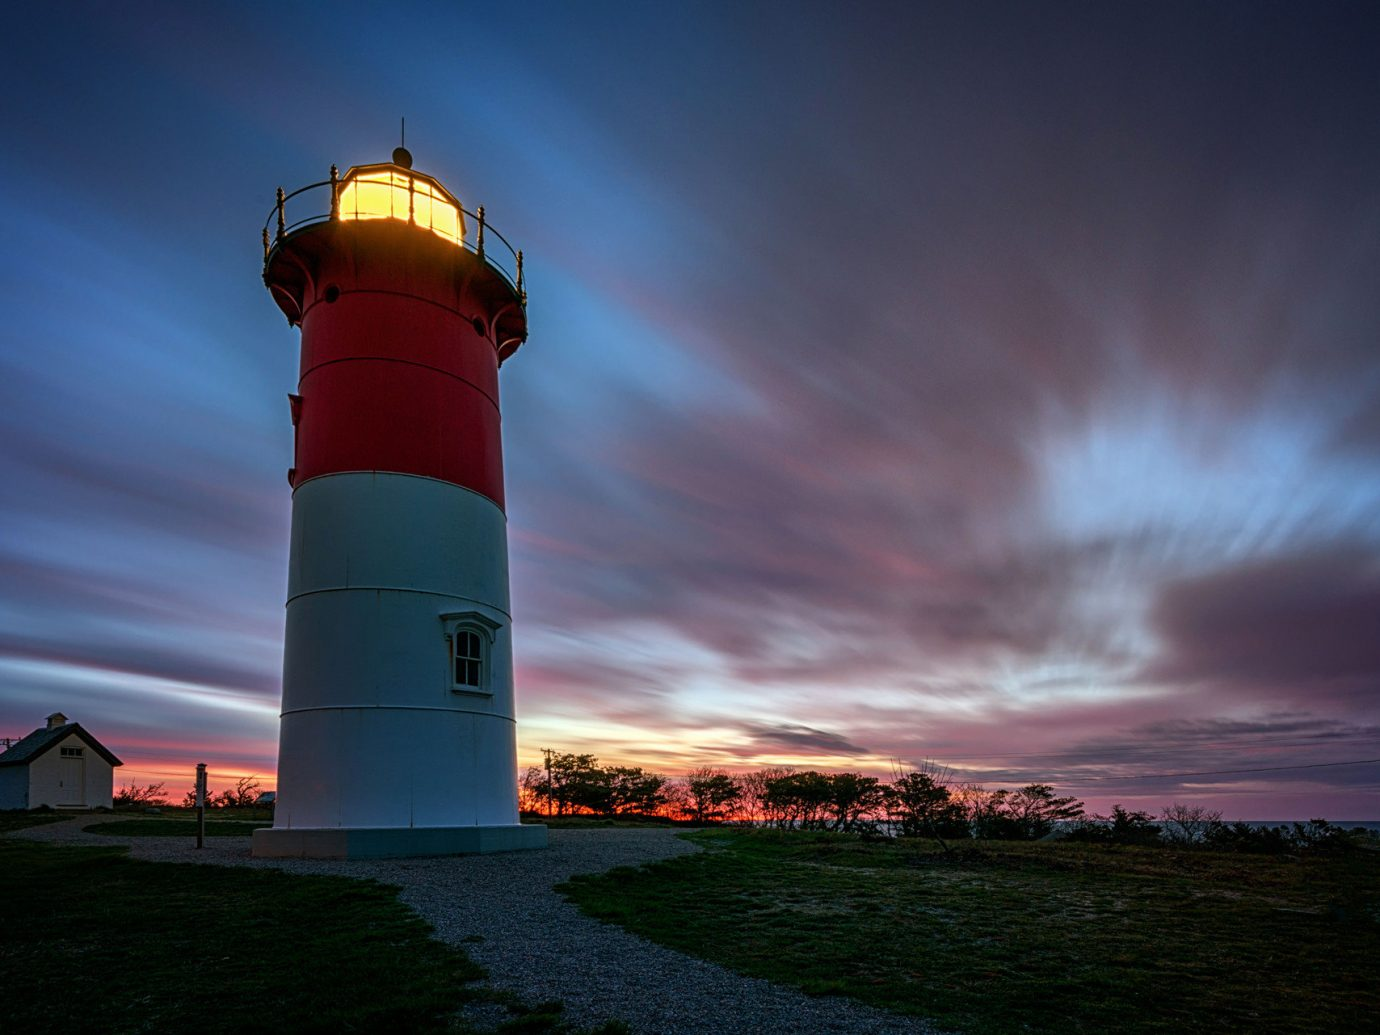 Trip Ideas sky outdoor lighthouse building tower night light cloud Sea Sunset evening dusk dawn Coast distance